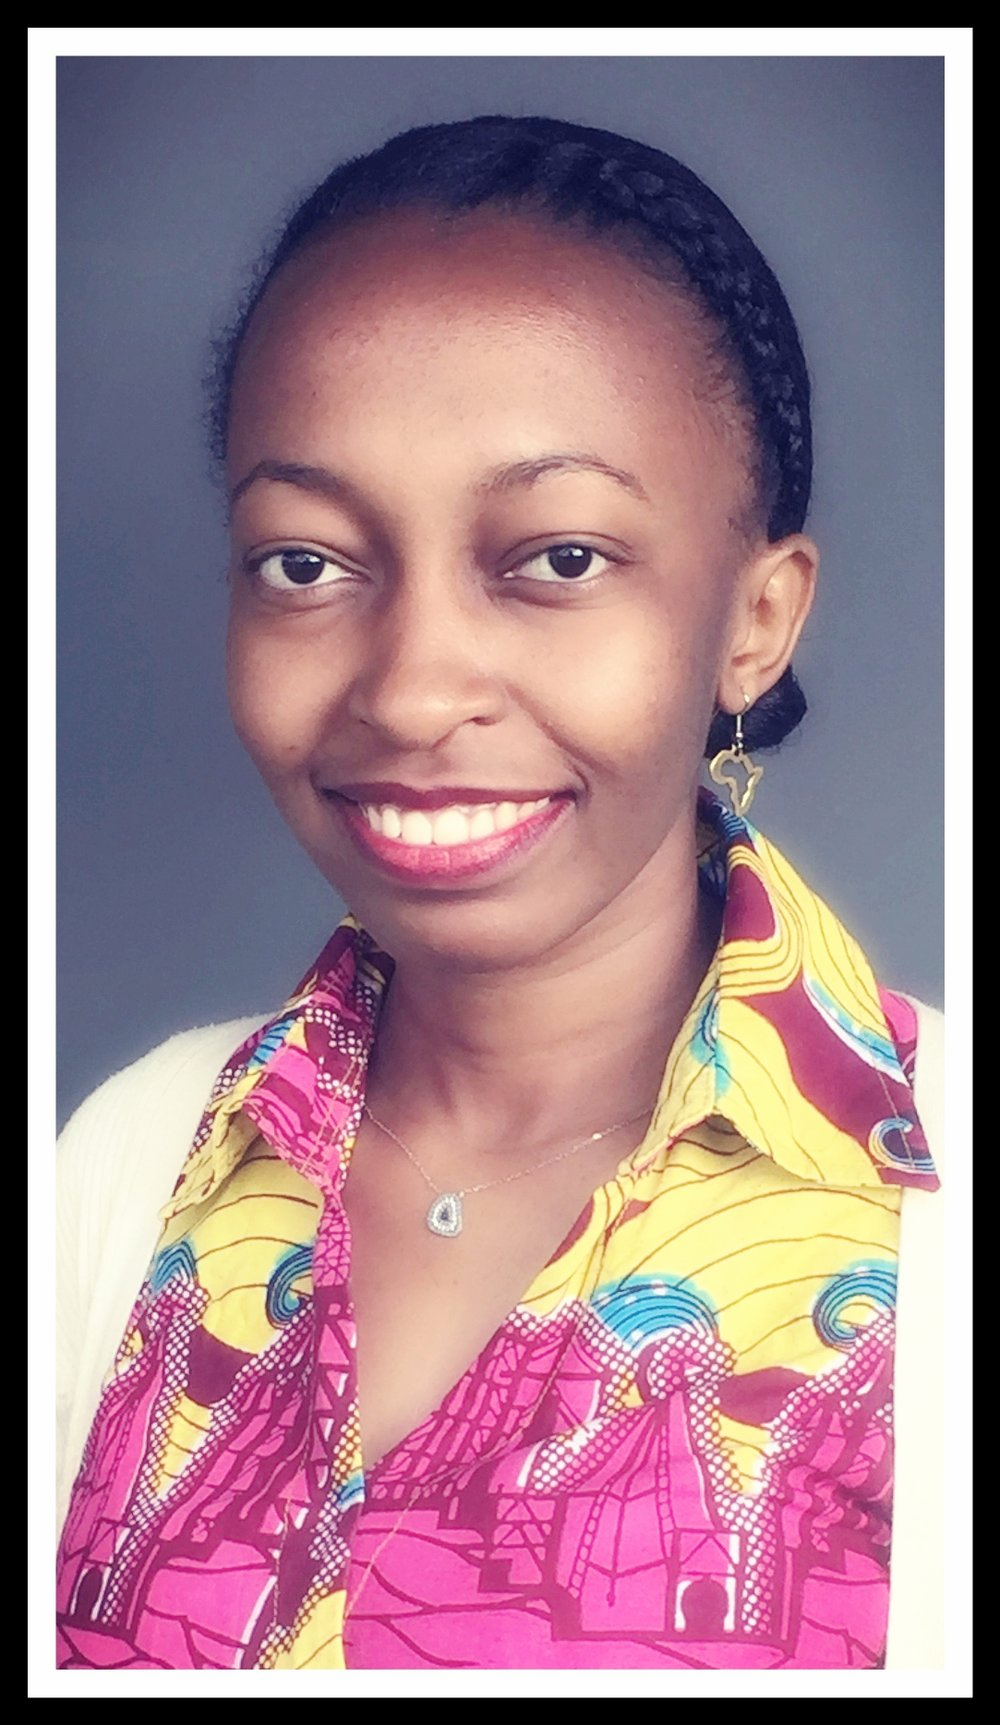 Stephanie Njerenga